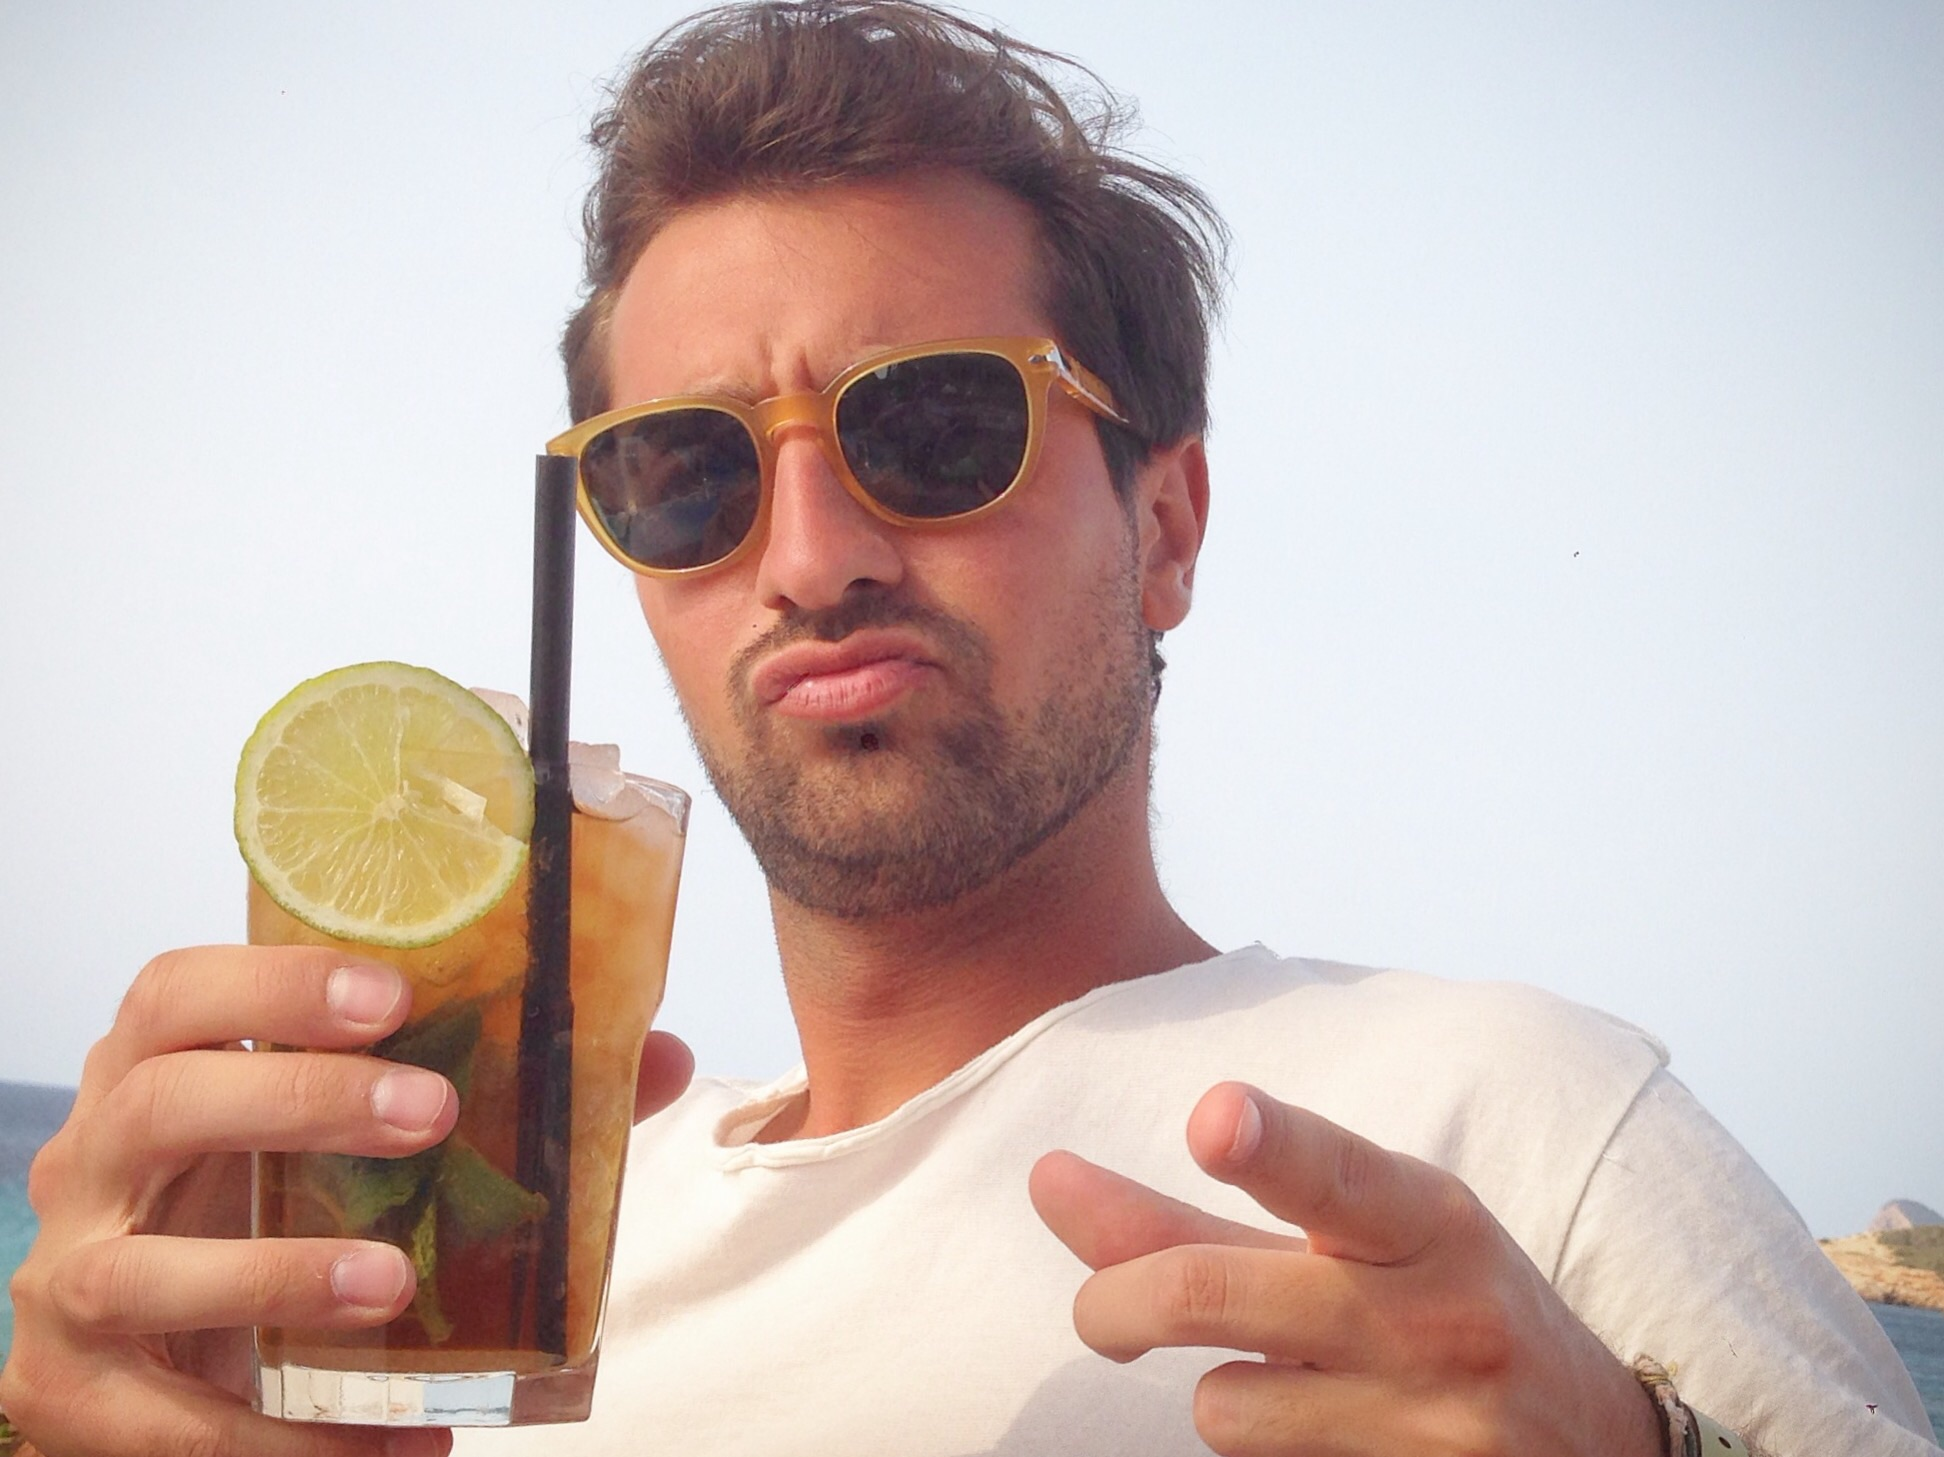 Estate 2015 Summer mare spiaggia Viaggi travel Ibiza pacha vita notturna disco Stefano Colicchio travel blogger